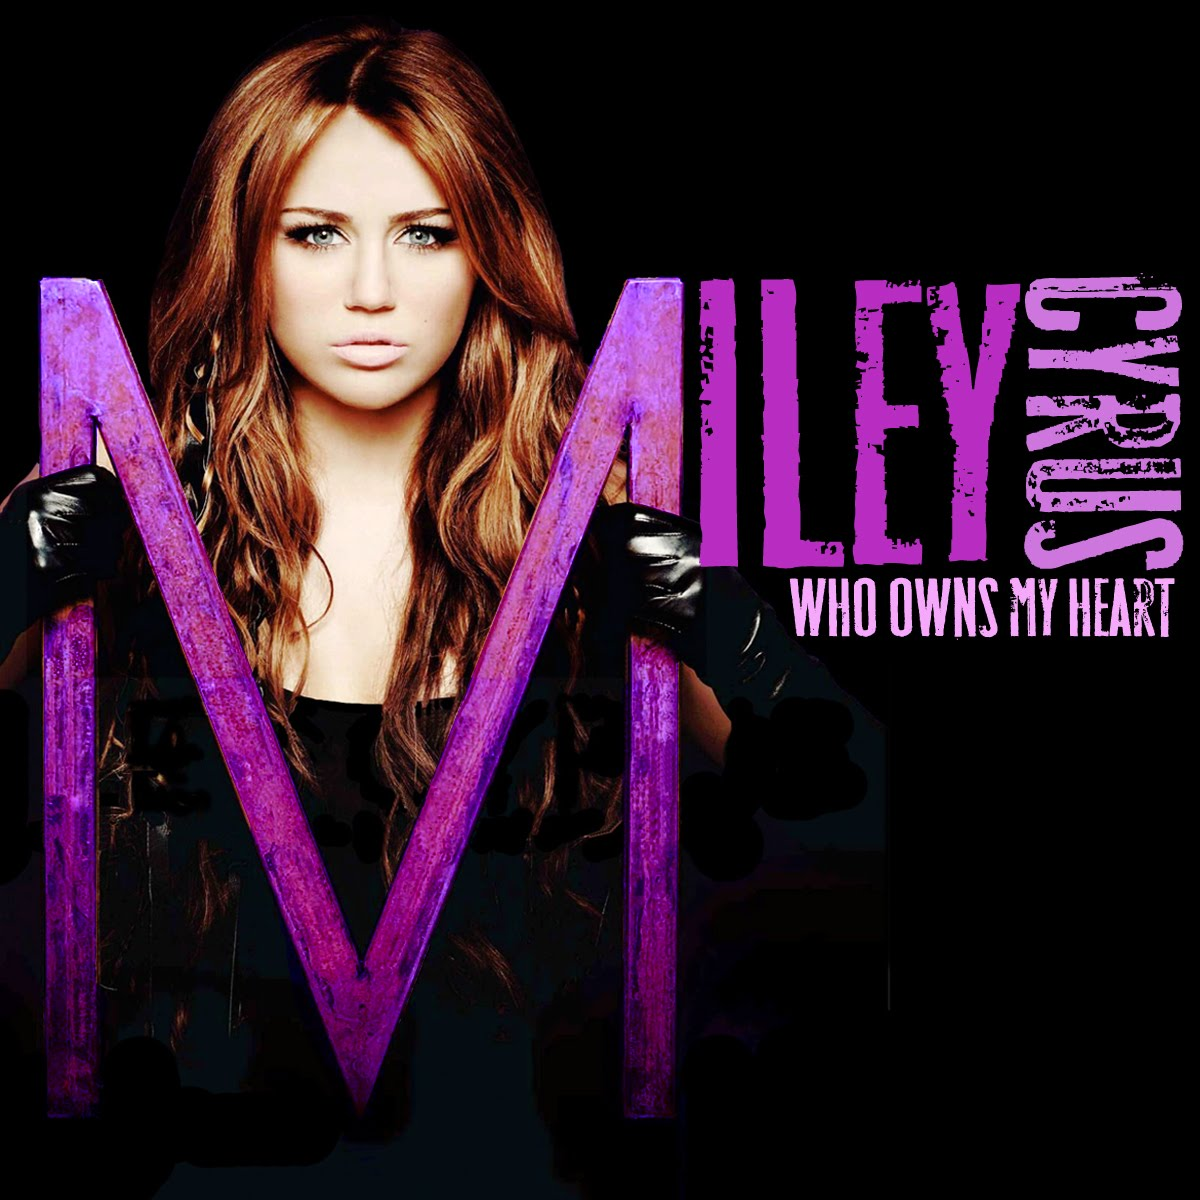 http://1.bp.blogspot.com/_fdfRpP2AbC4/TK-e-3rskiI/AAAAAAAAIBc/MgDQEhxnO0g/s1600/lyricsvideoclips_Miley_Cyrus-Who_Owns_My_Heart.jpg